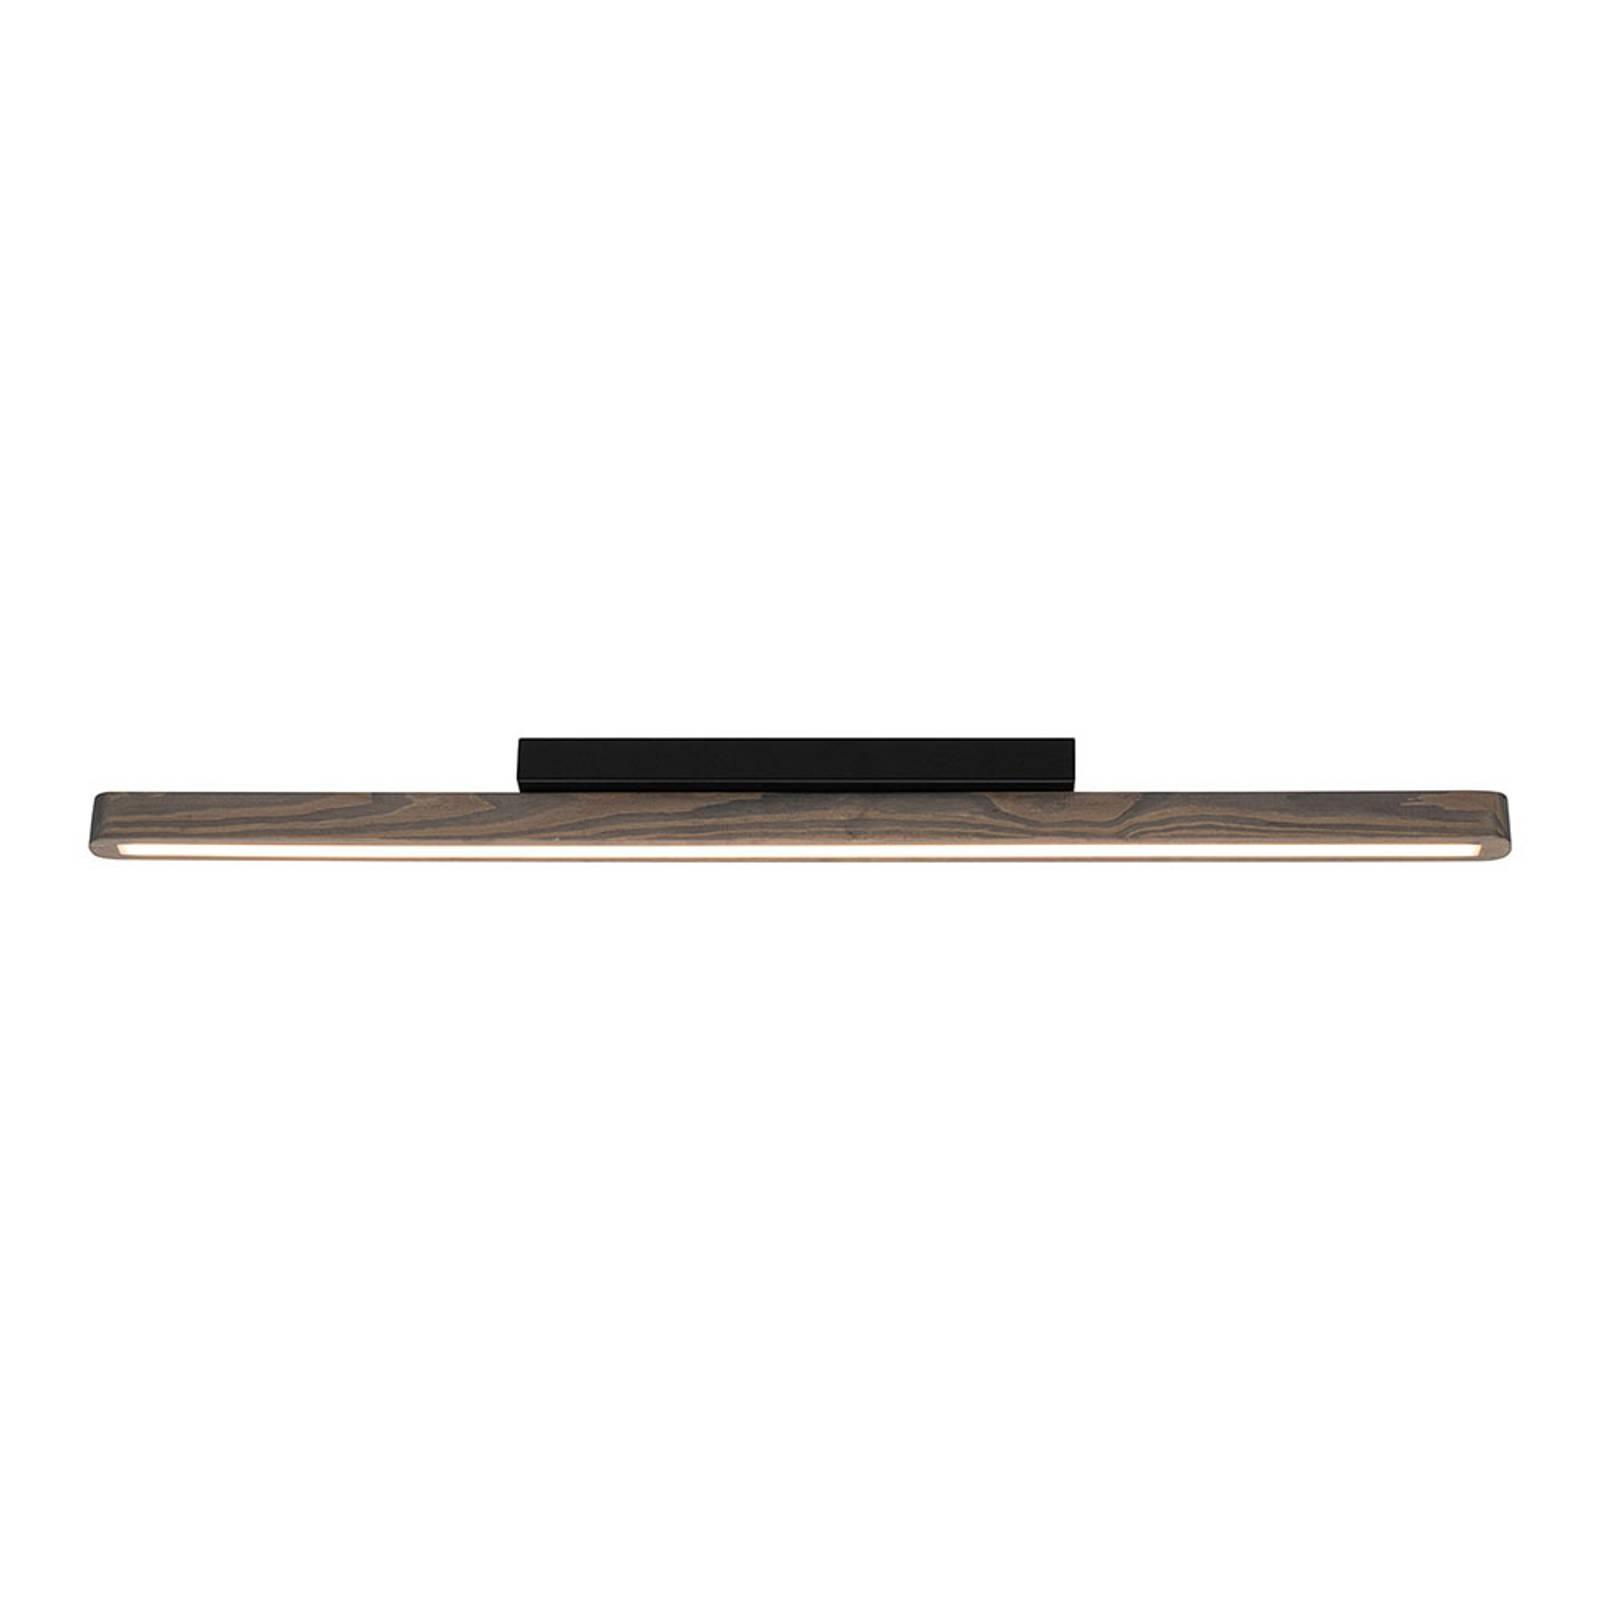 LED-kattovalaisin Forestier, pituus 90 cm